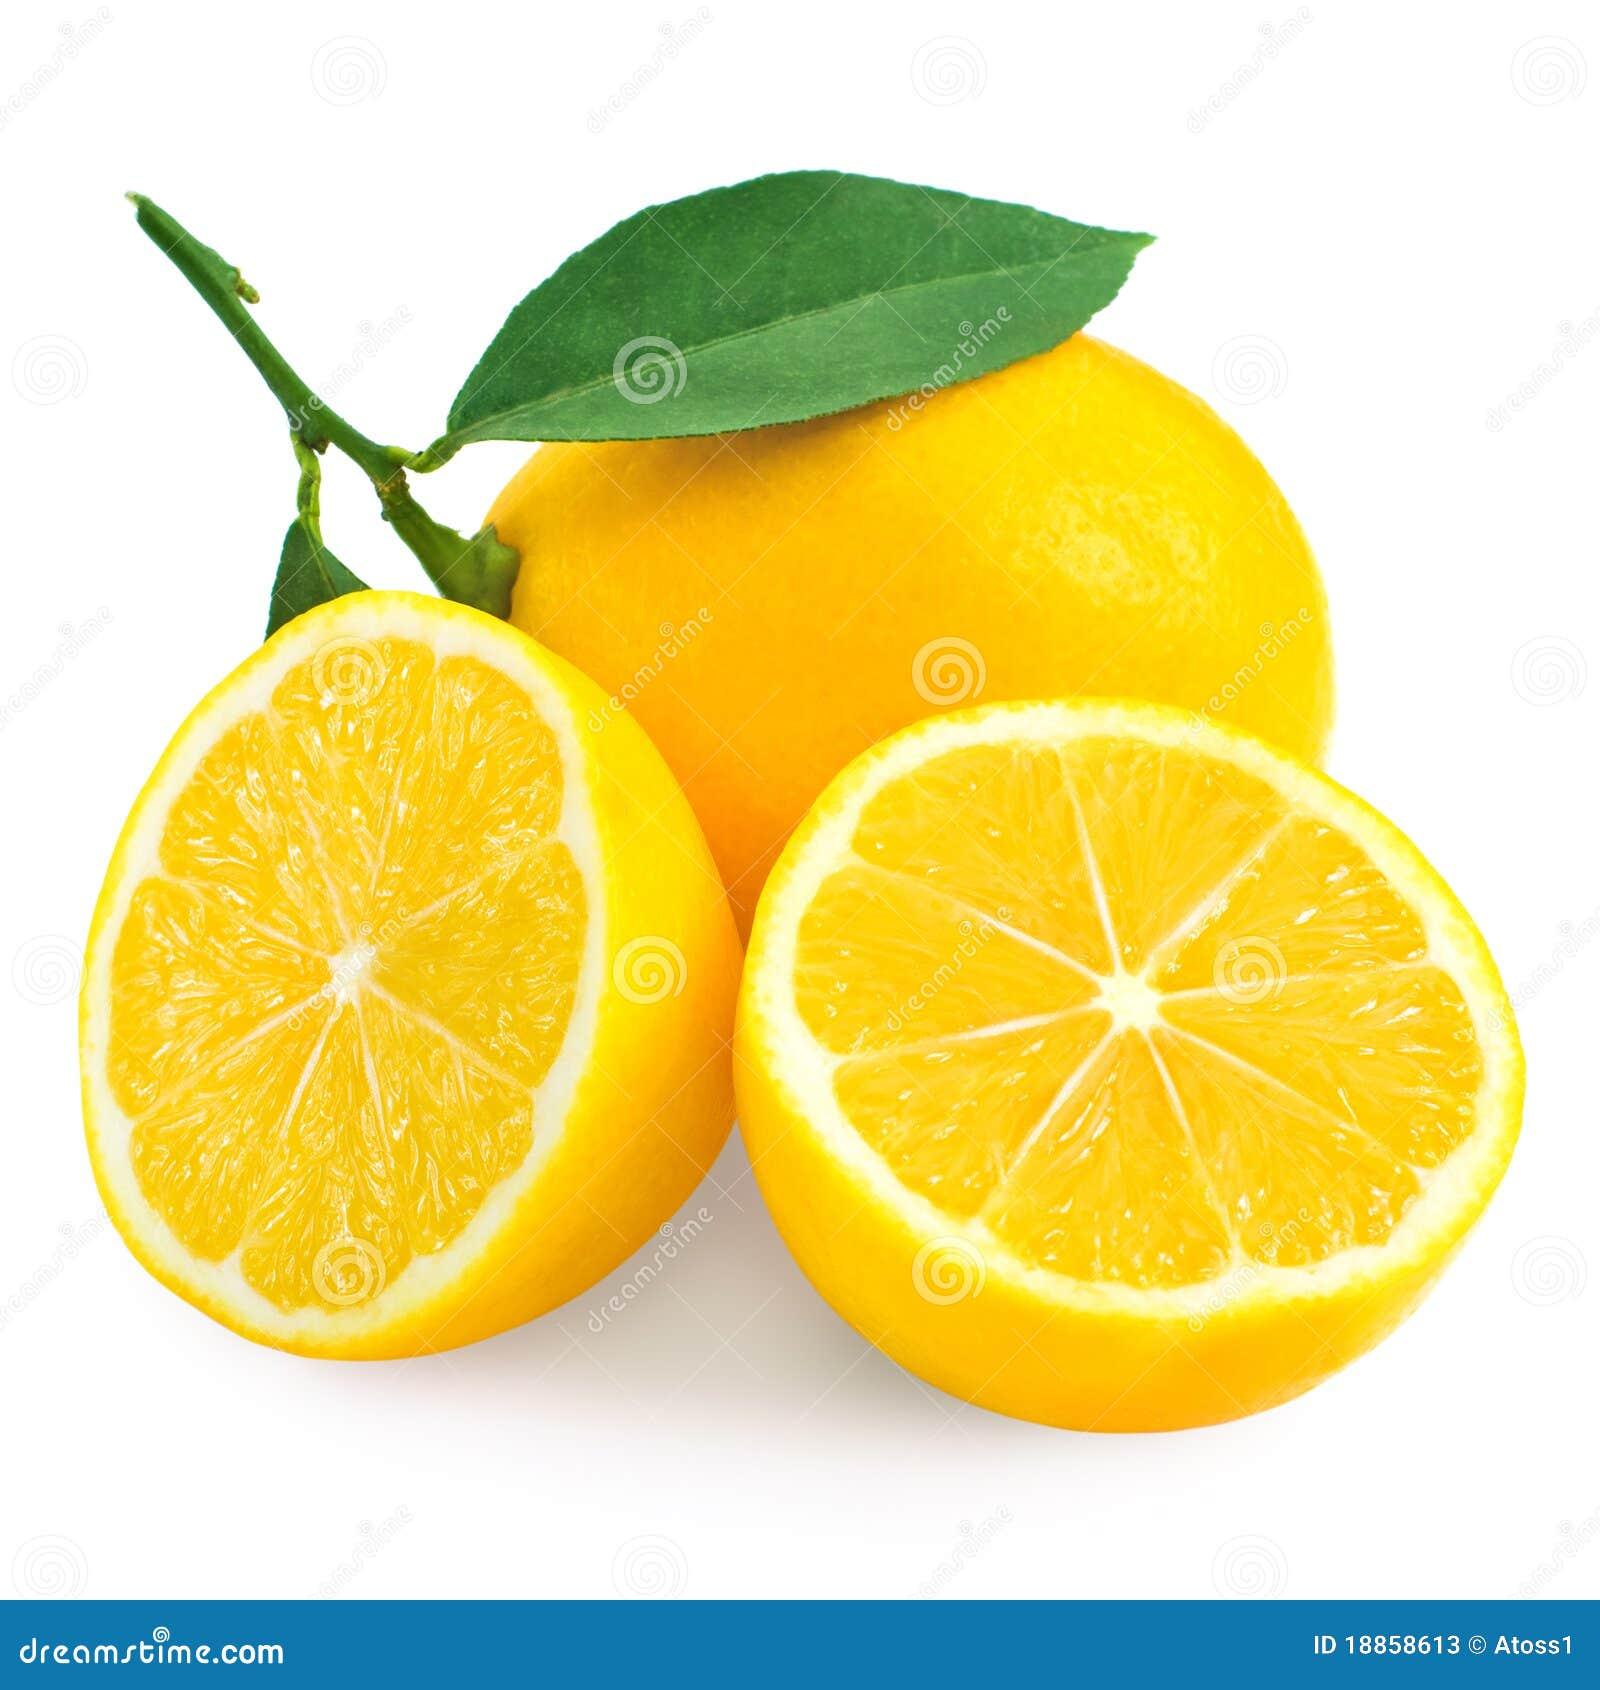 Fresh lemon citrus and half